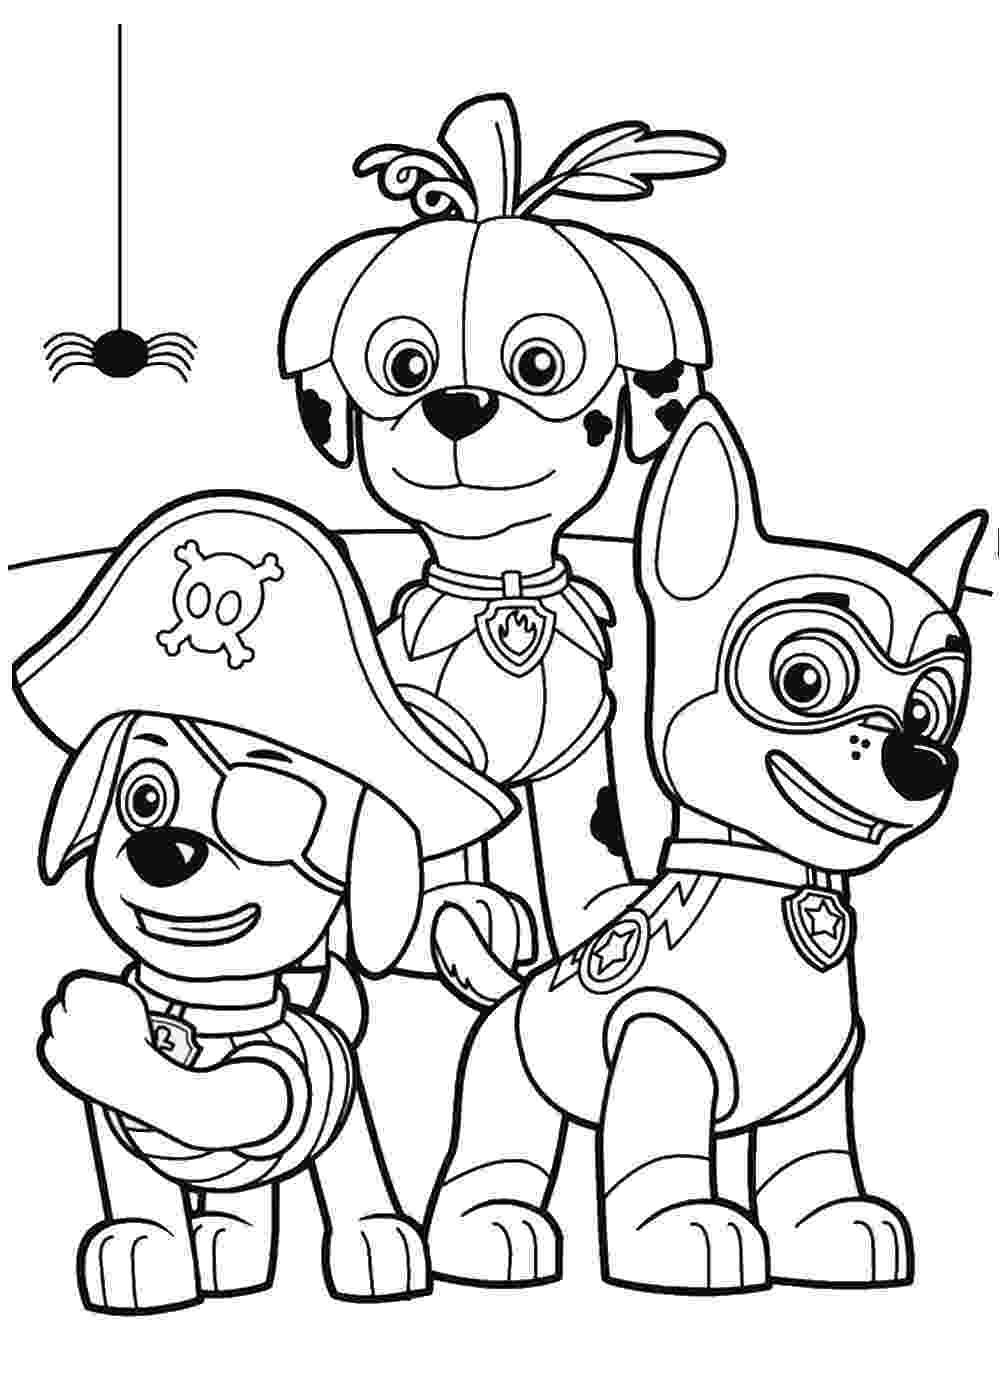 paw patrol coloring pages paw patrol badges coloring page free printable coloring pages coloring paw patrol